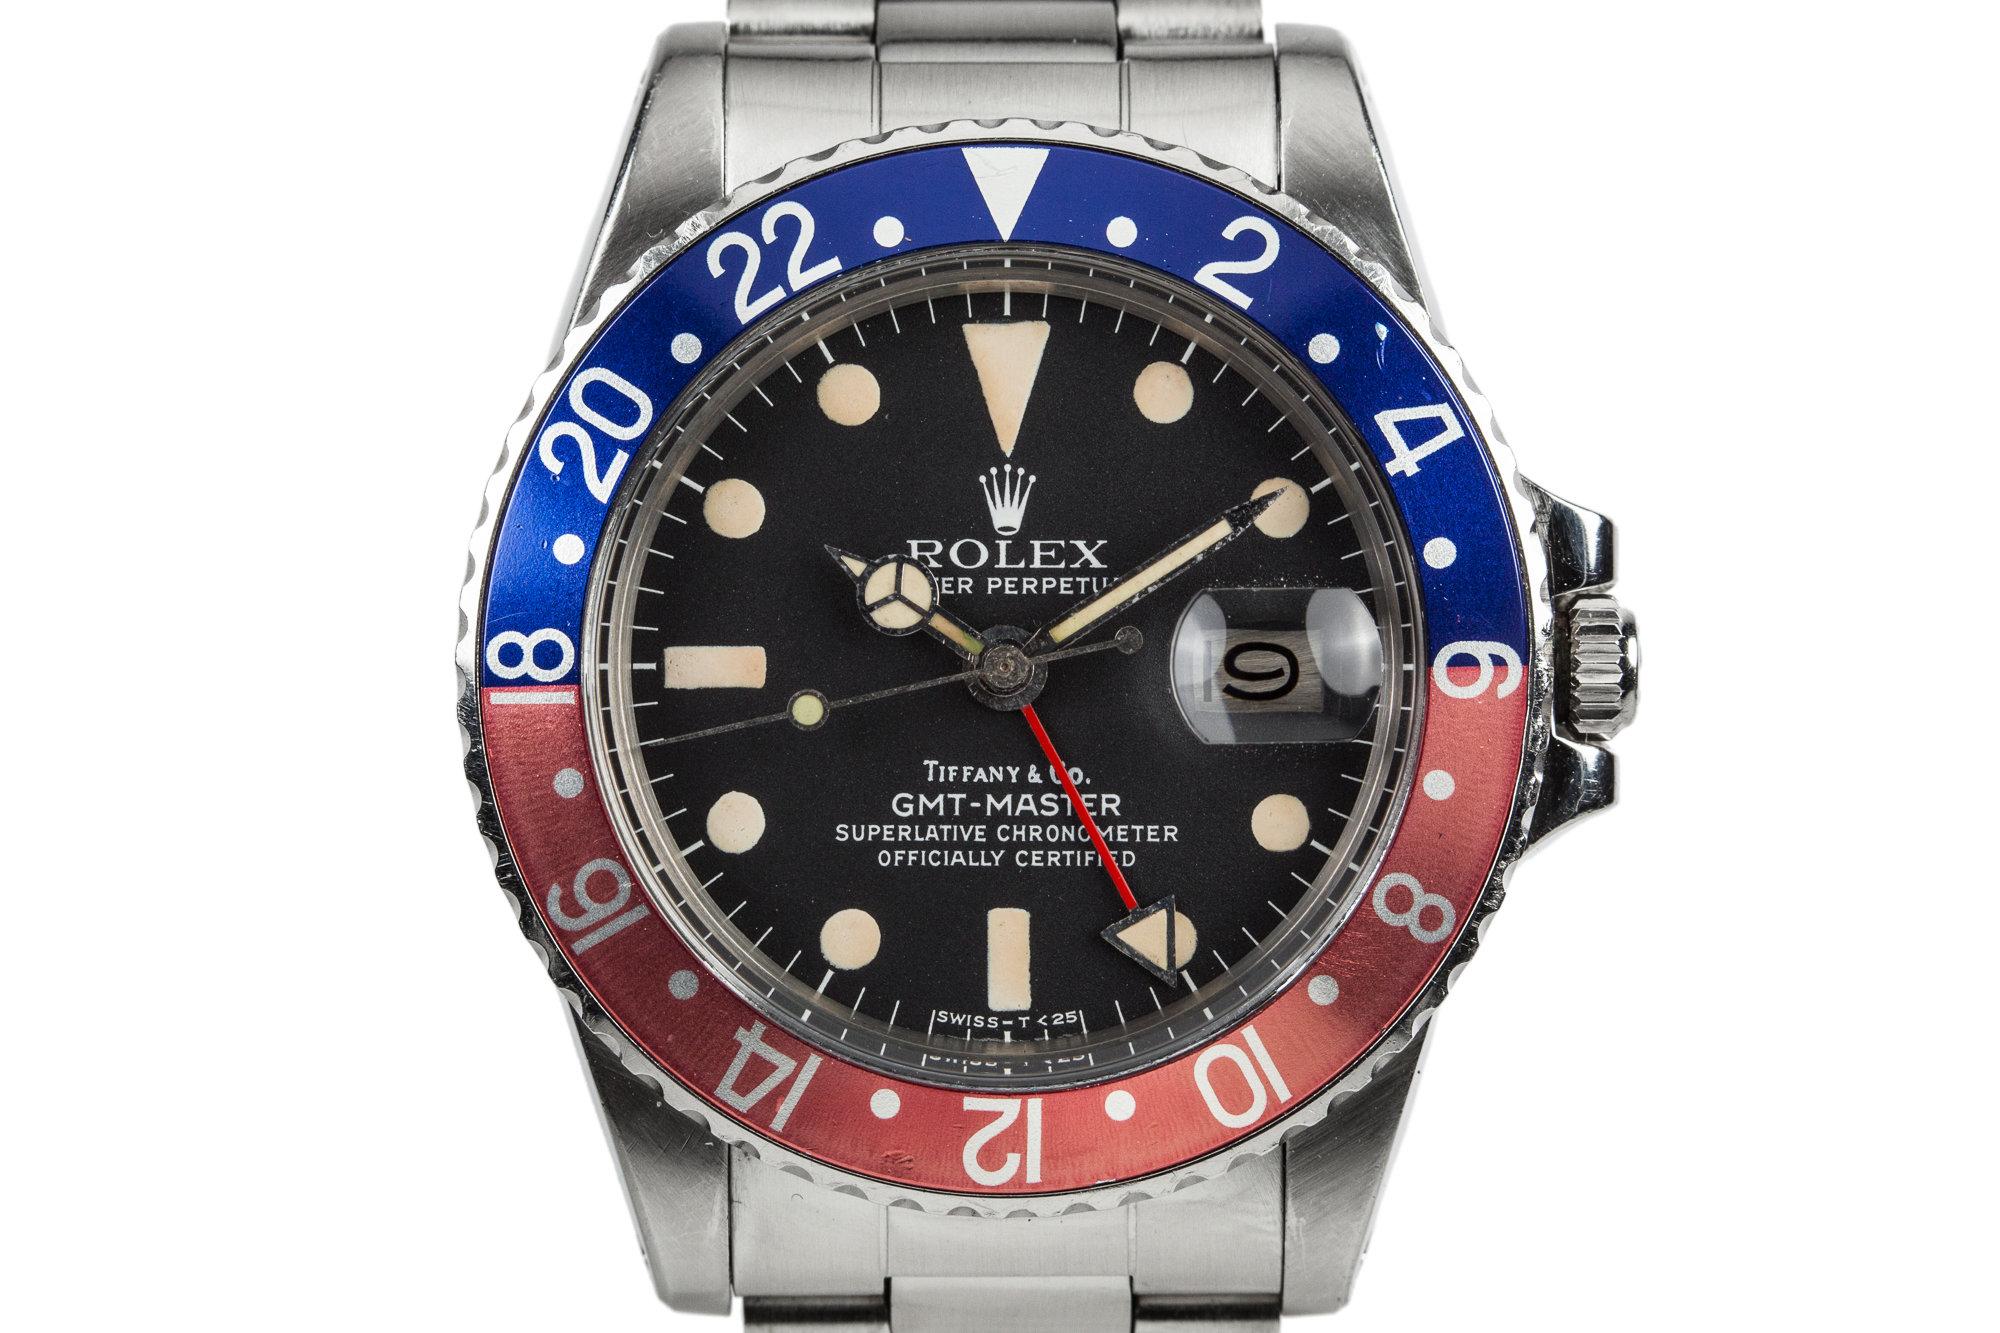 Rolex GMT-Master 1675 Tiffany&Co